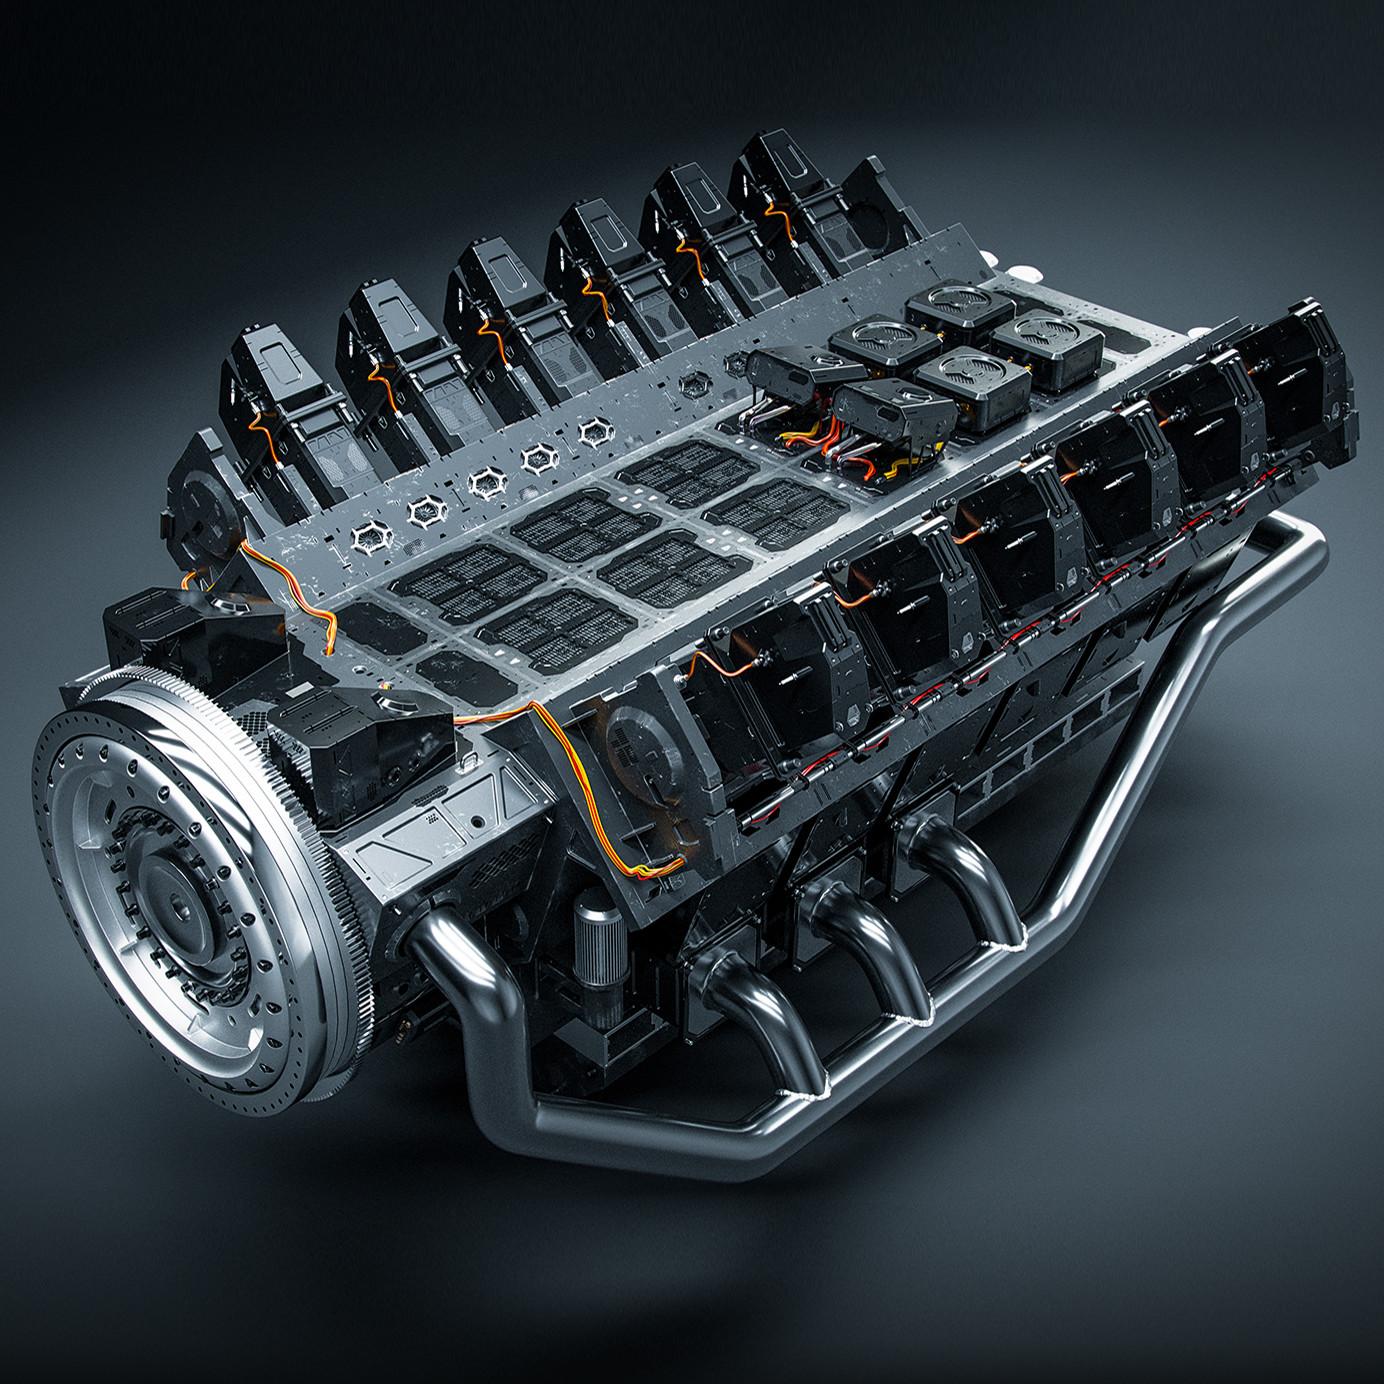 Sci-Fi Engine #1